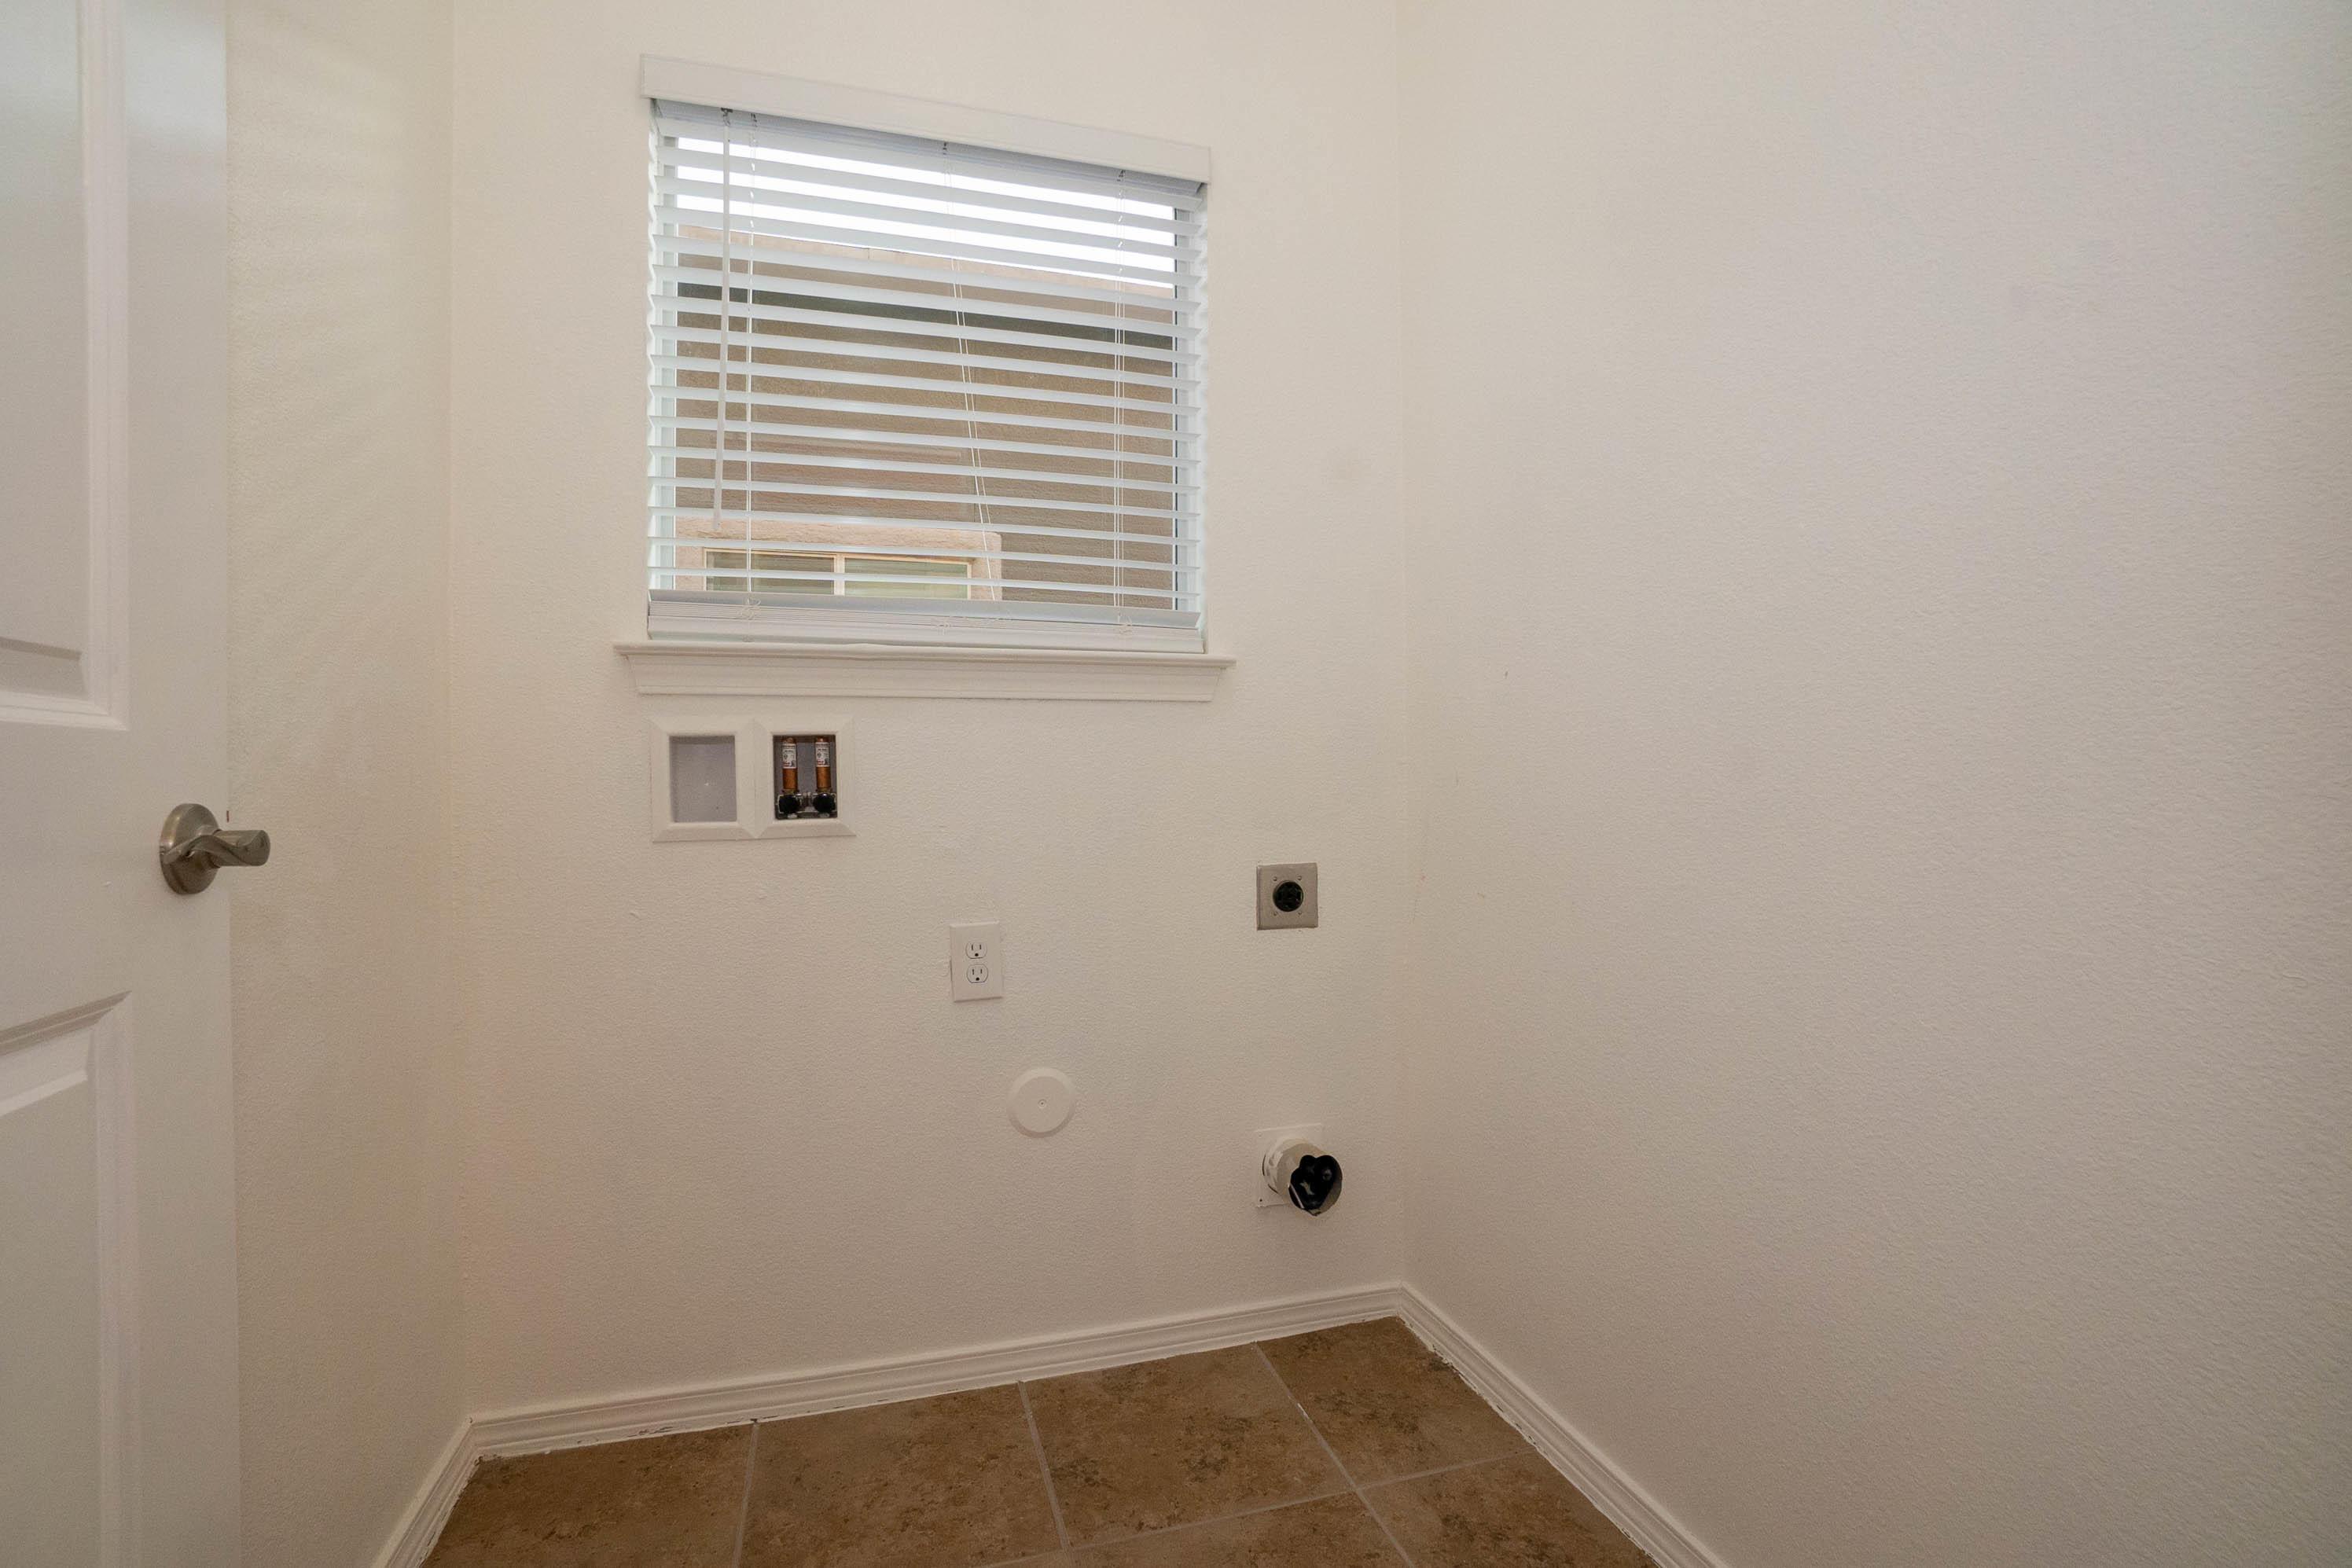 2214 Hannah Leigh, El Paso, Texas 79938, 4 Bedrooms Bedrooms, ,3 BathroomsBathrooms,Residential,For sale,Hannah Leigh,839507